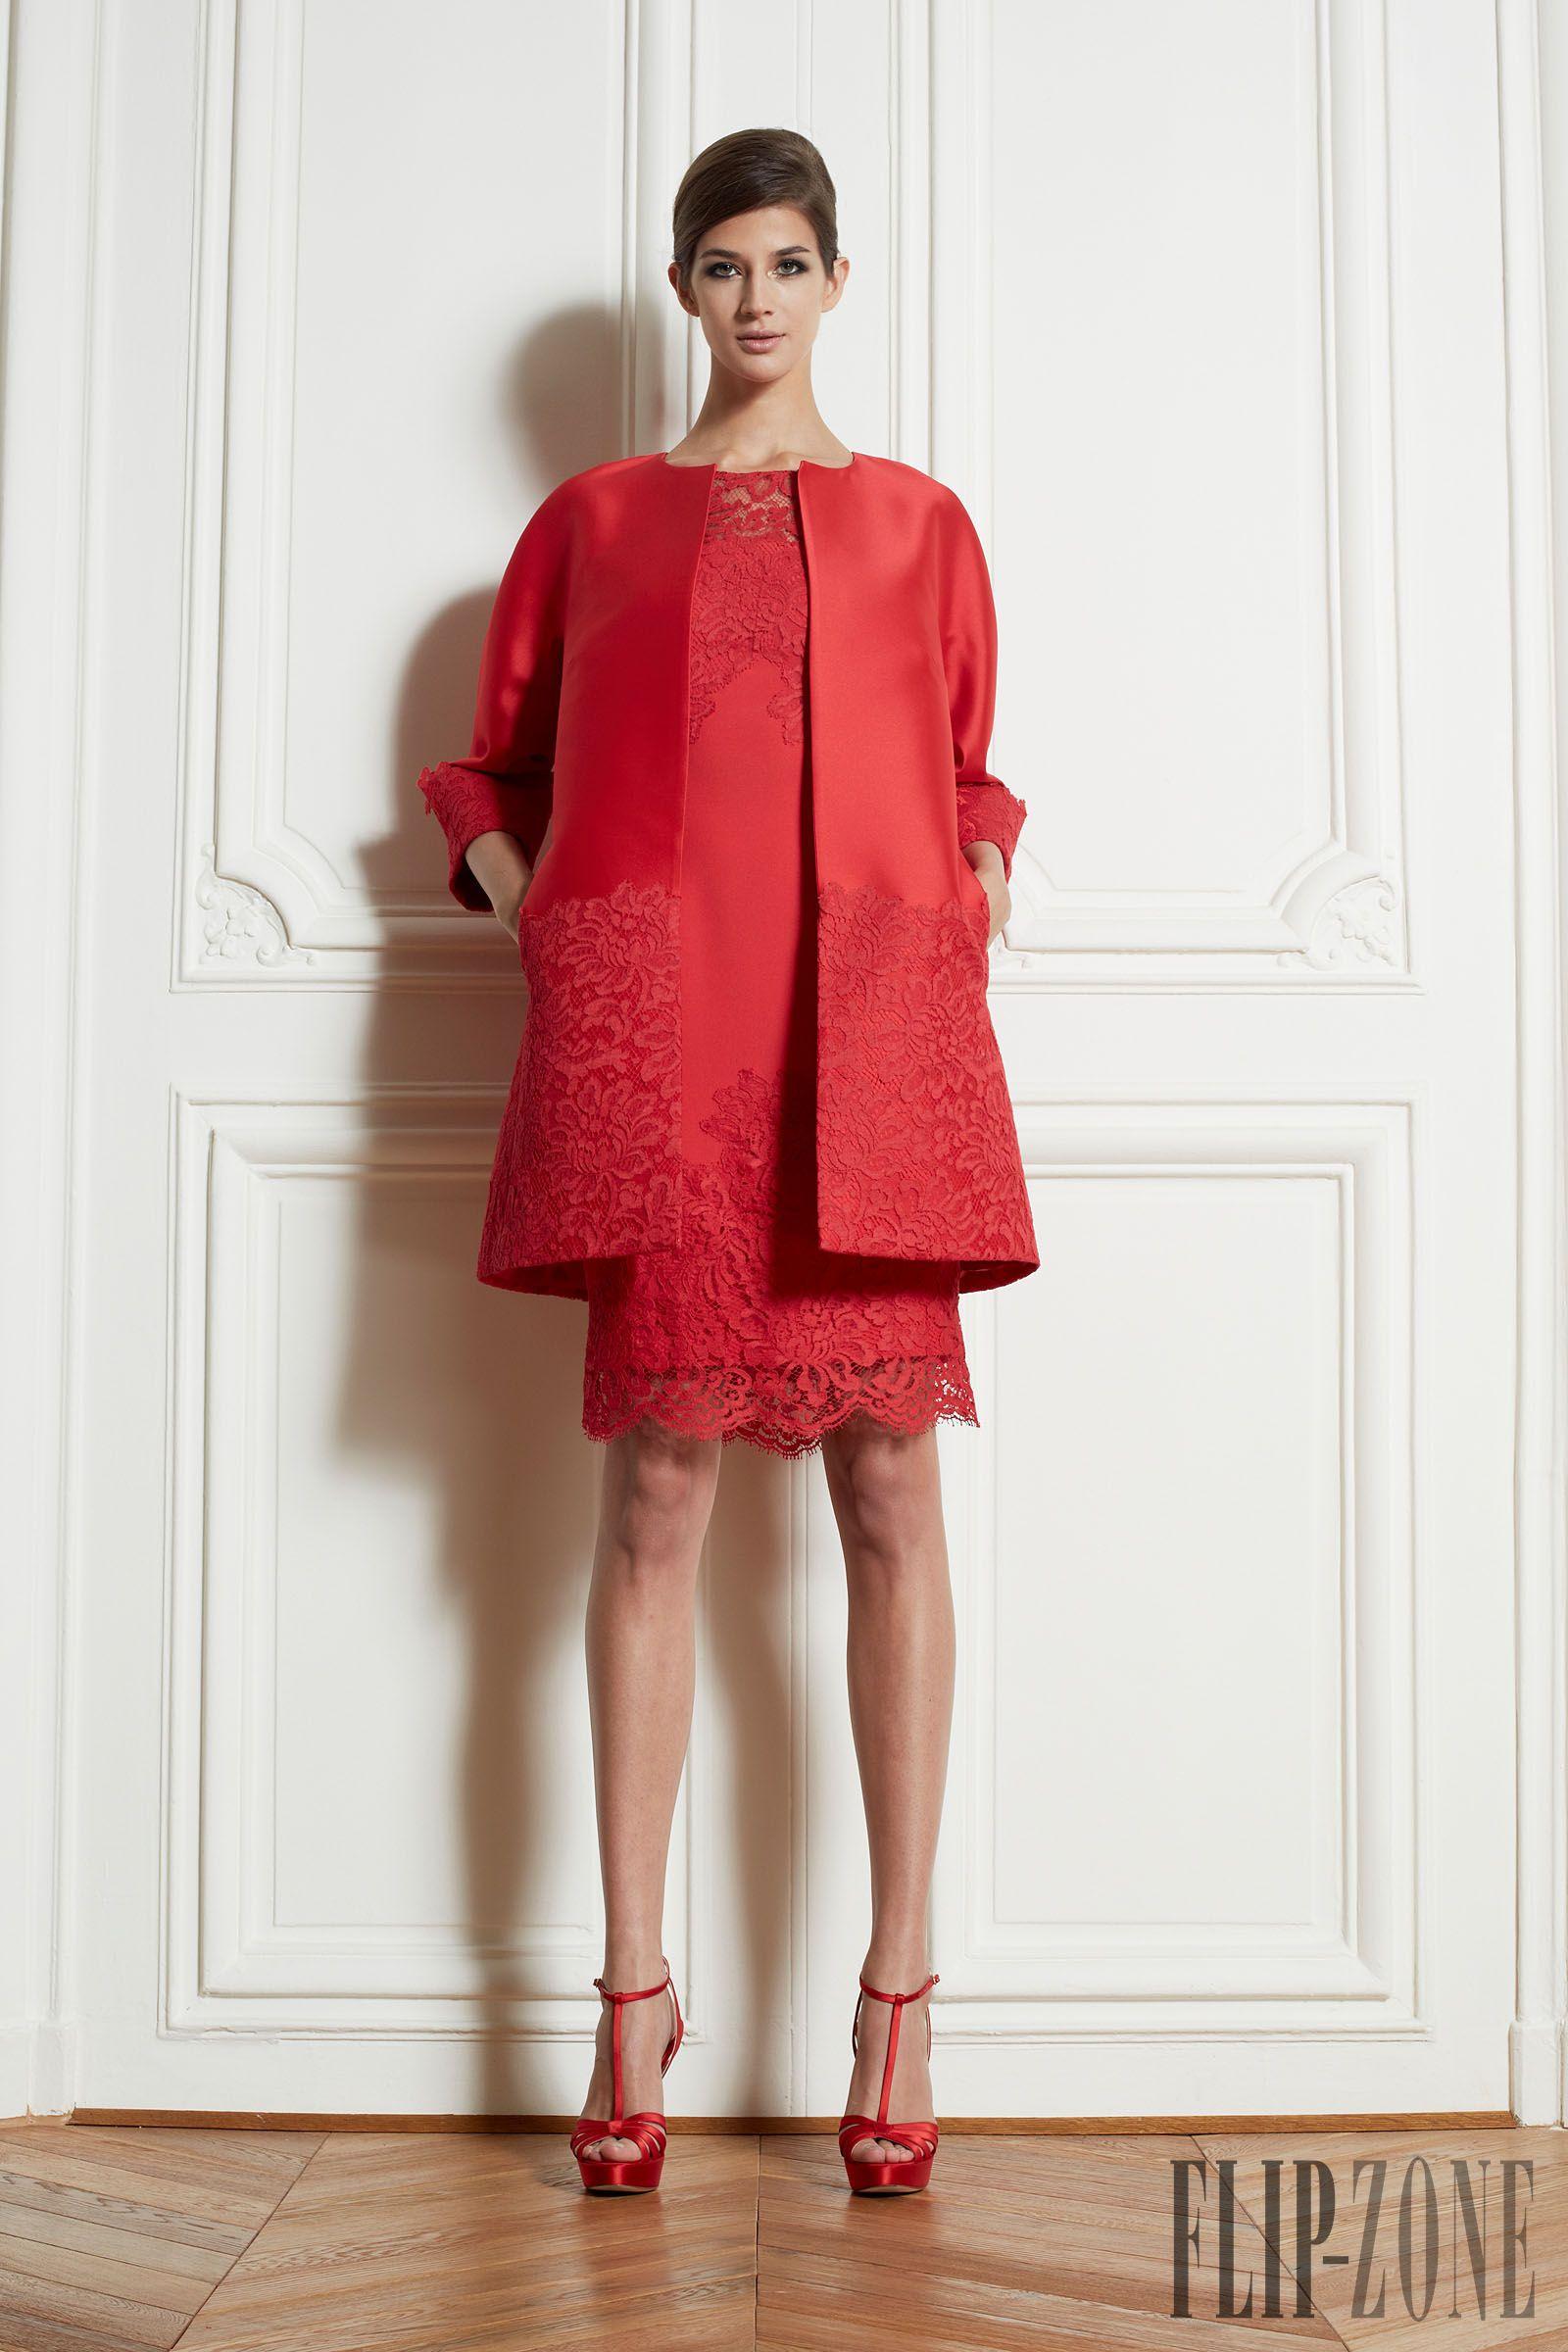 زهير مراد [Zuhair Murad] ربيع-صيف 2013 - ملابس جاهزة - http://ar.flip-zone.com/fashion/ready-to-wear/fashion-houses-42/zuhair-murad-3130